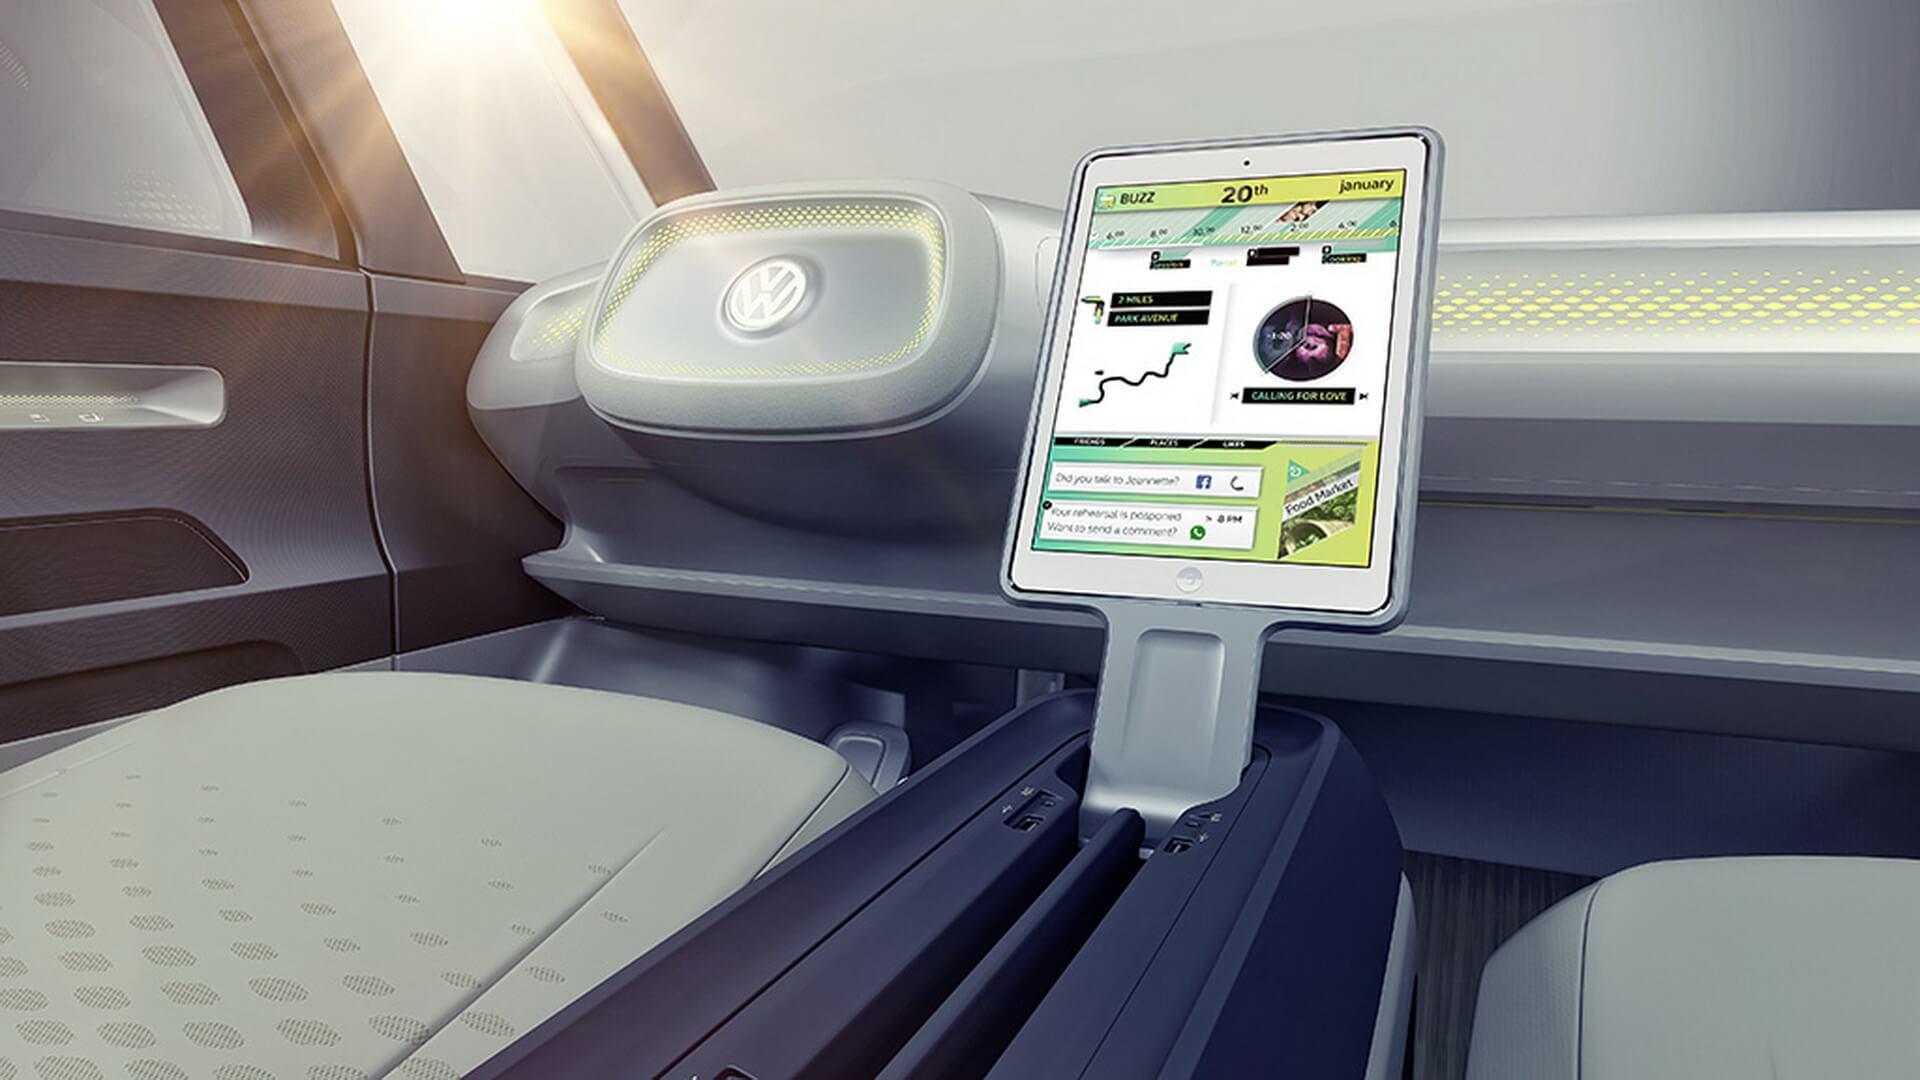 Ipad в качестве информационно-развлекательного центра VW I.D. Buzz